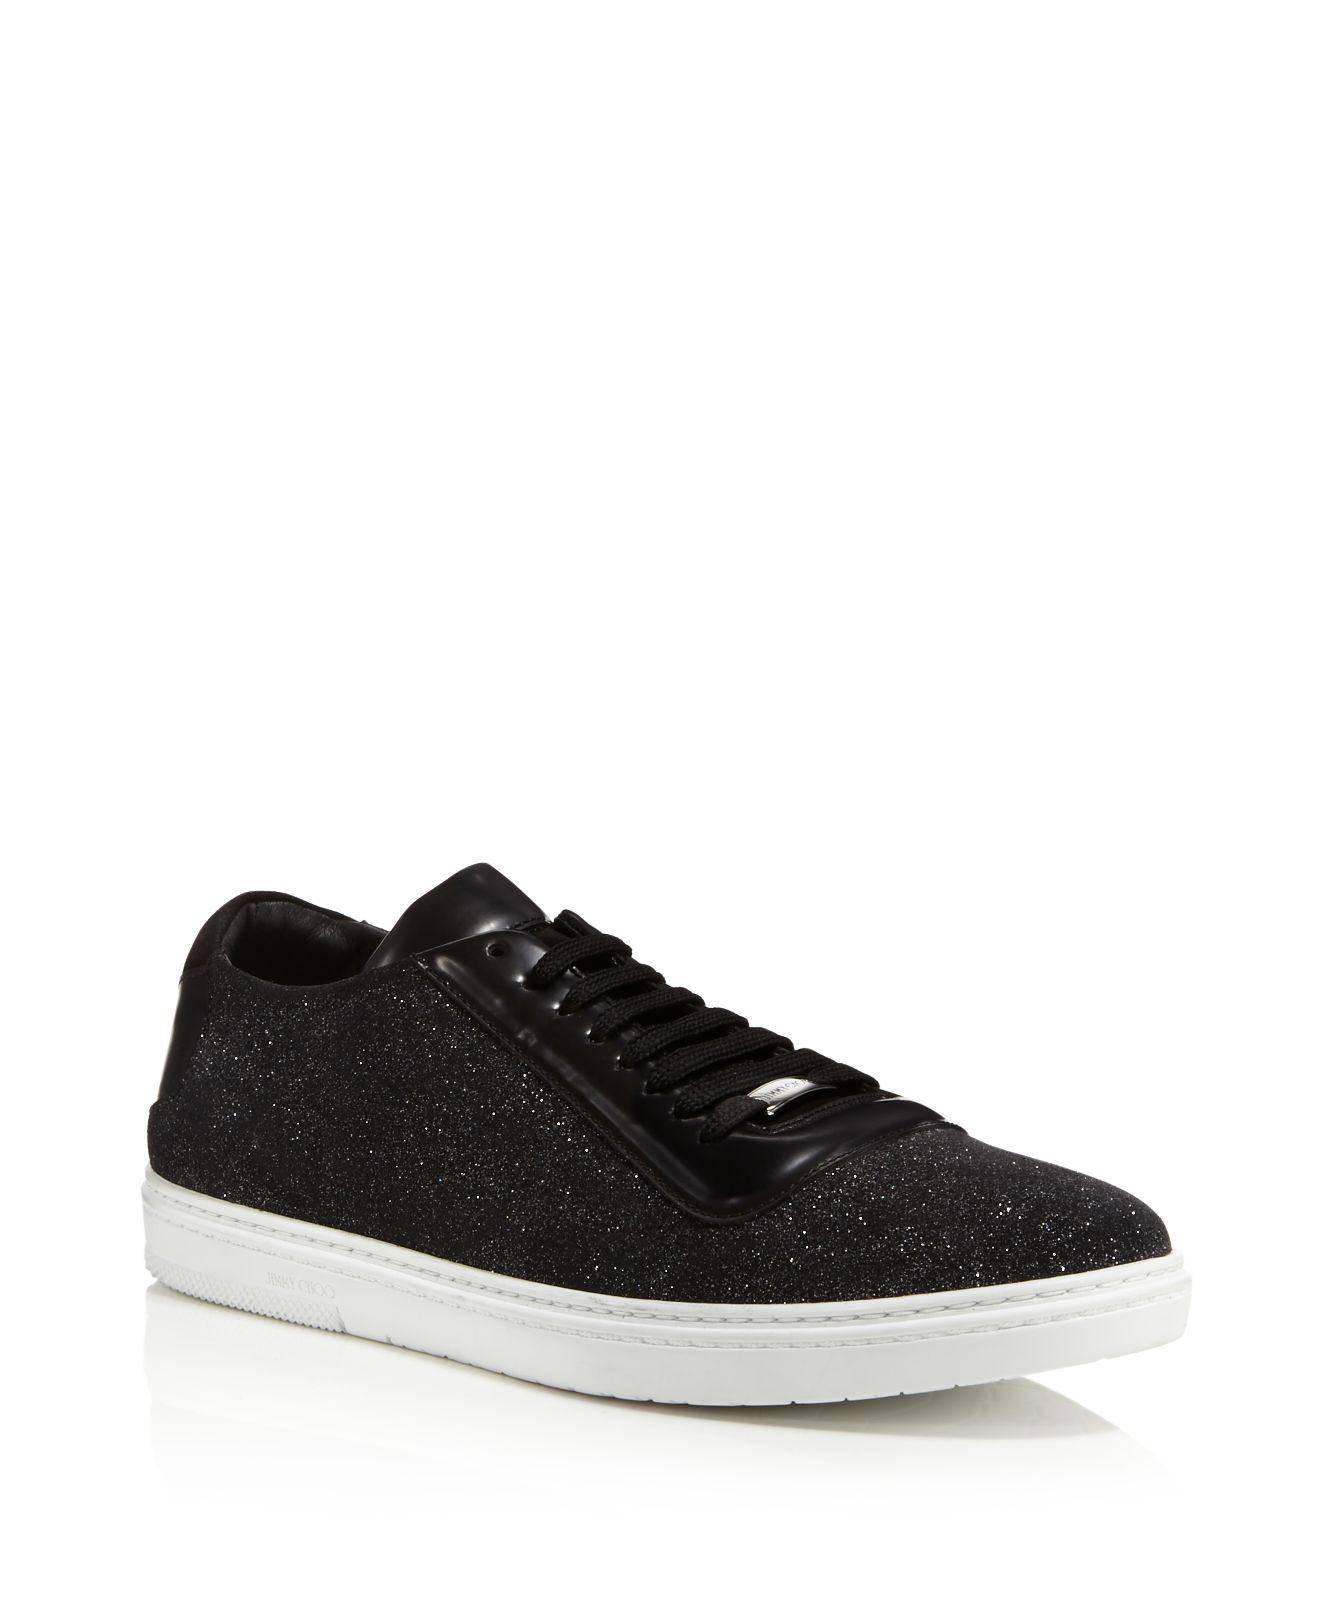 Jimmy choo Crackled Metallic Benn Sneakers Free Shipping Genuine Online Cheap Quality Nicekicks Cheap Online 2paiBiG